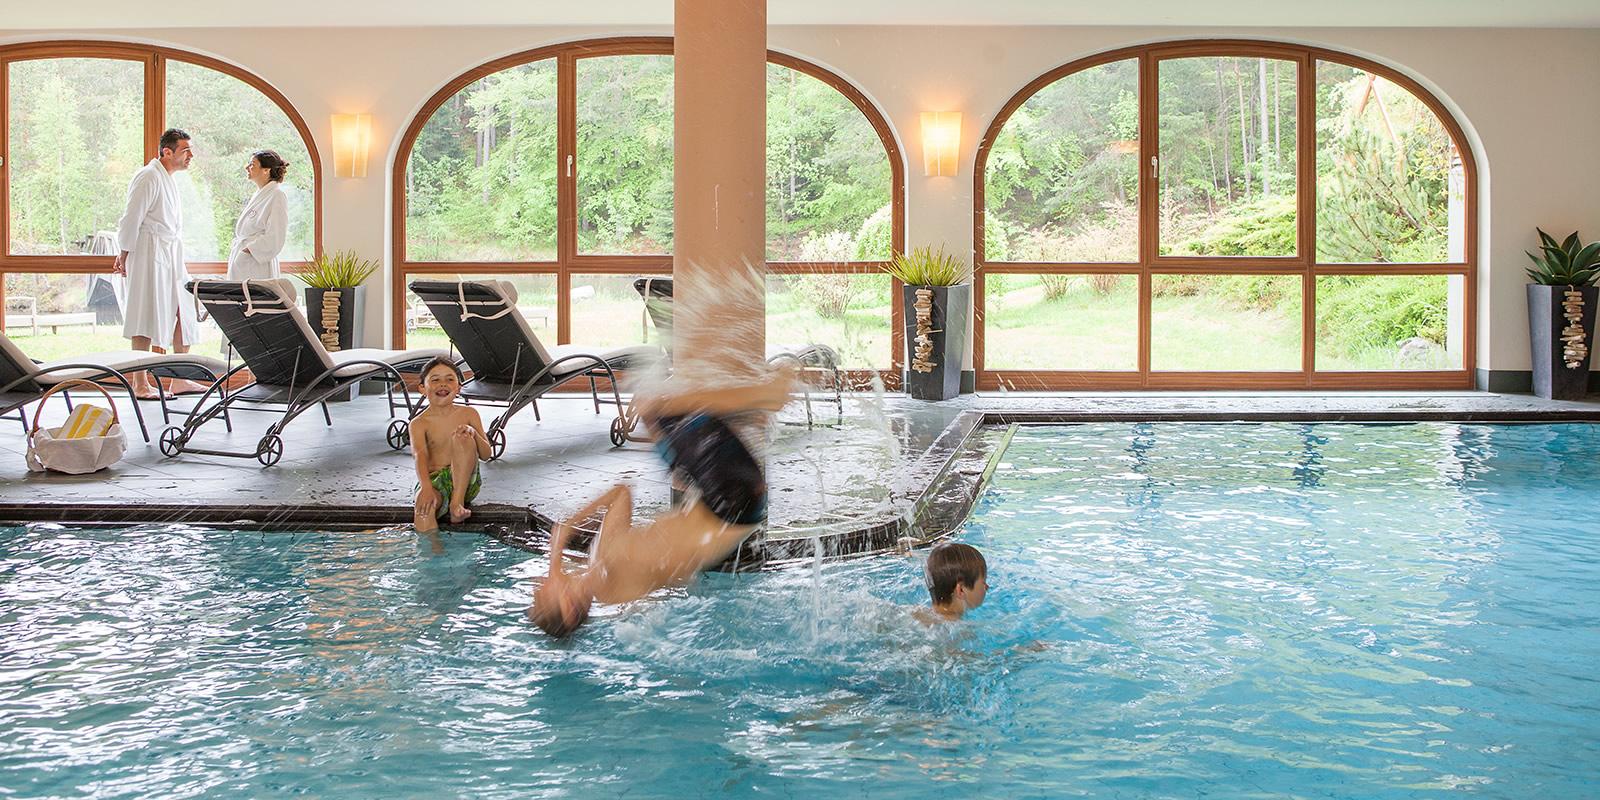 hotel s dtirol schwimmbad hallenbad pool am see weihrerhof. Black Bedroom Furniture Sets. Home Design Ideas